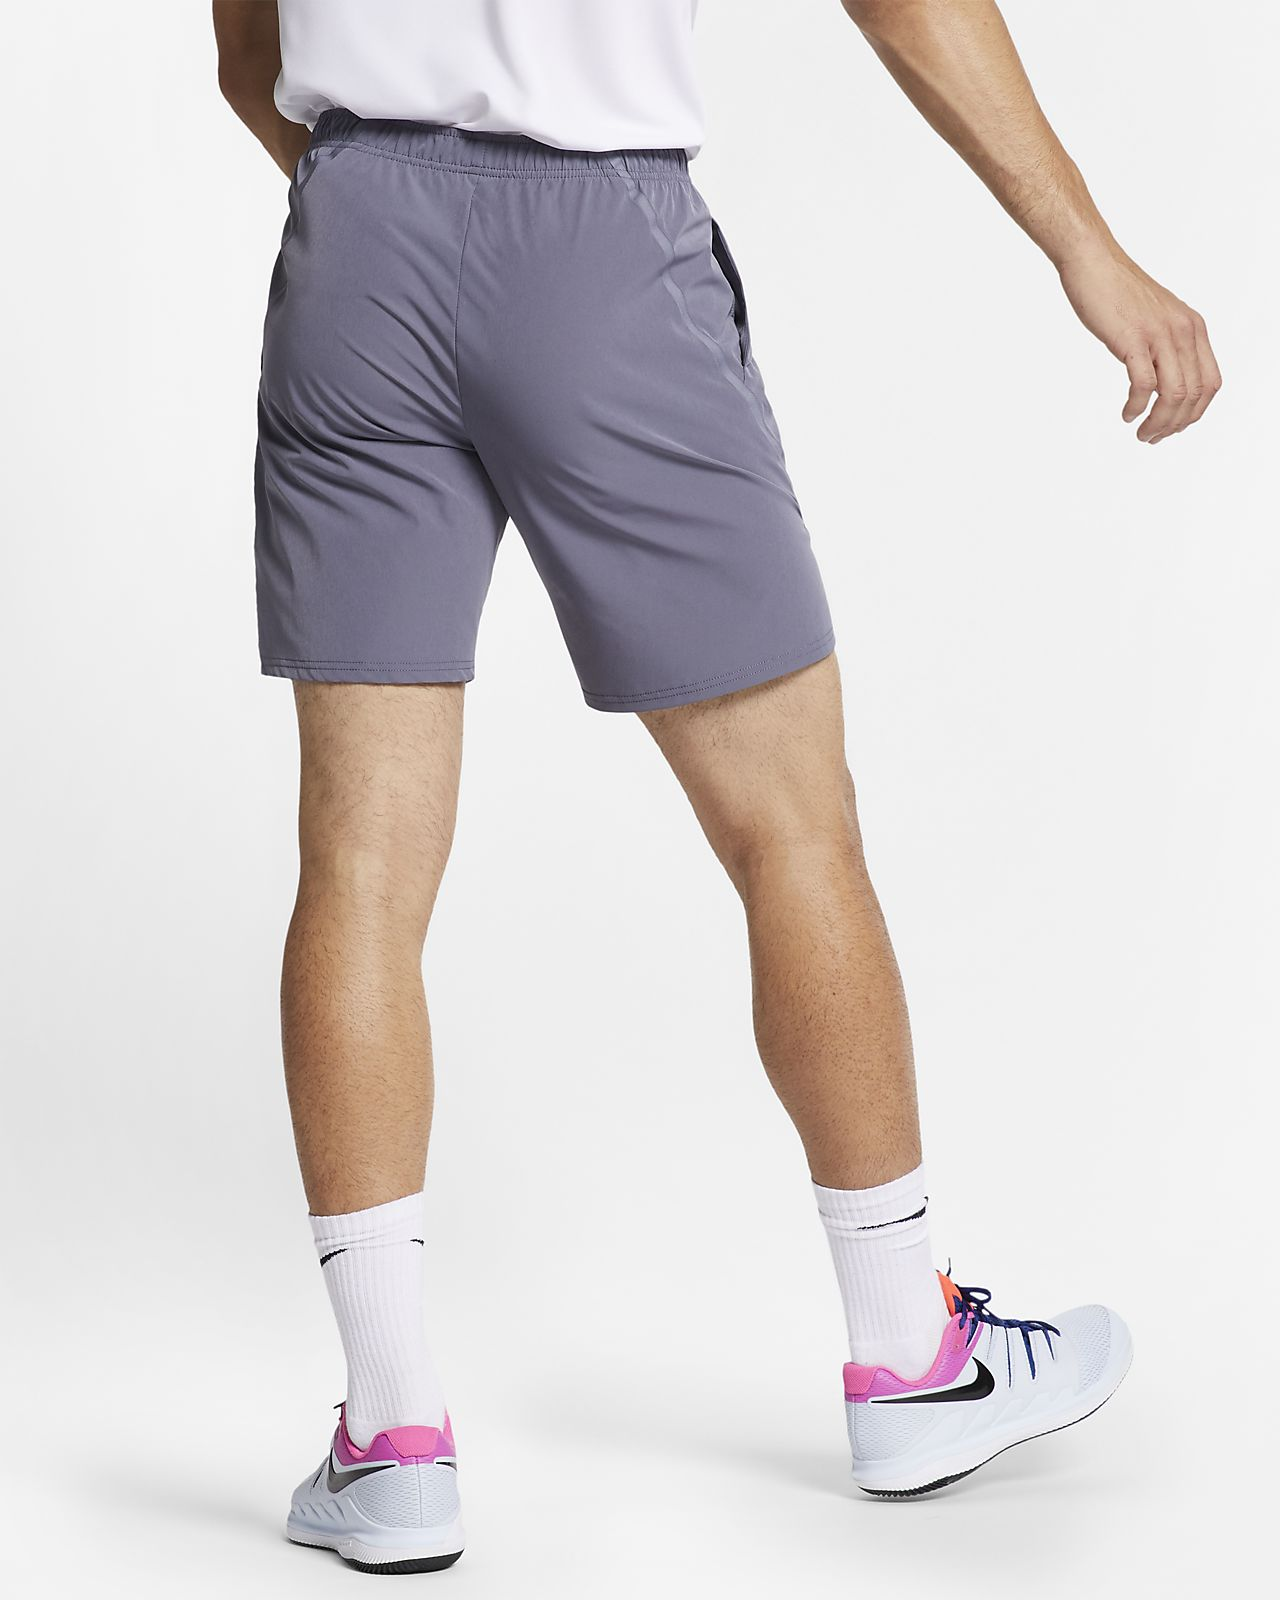 0d2bd838f0f08 NikeCourt Flex Ace Men's Tennis Shorts. Nike.com SE